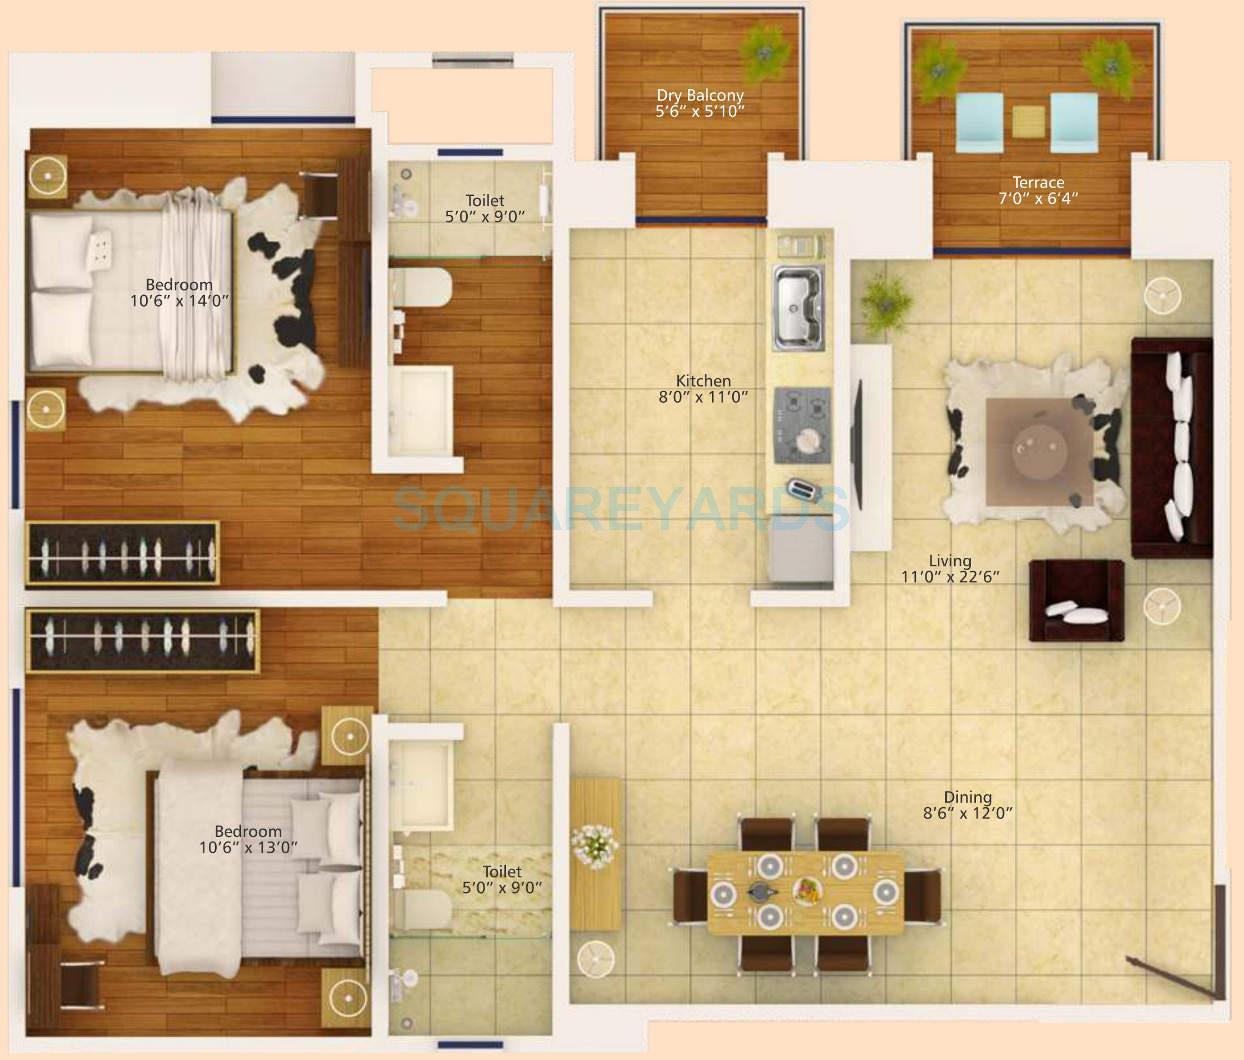 1 BHK 560 Sq. Ft. Apartment Floor Plan